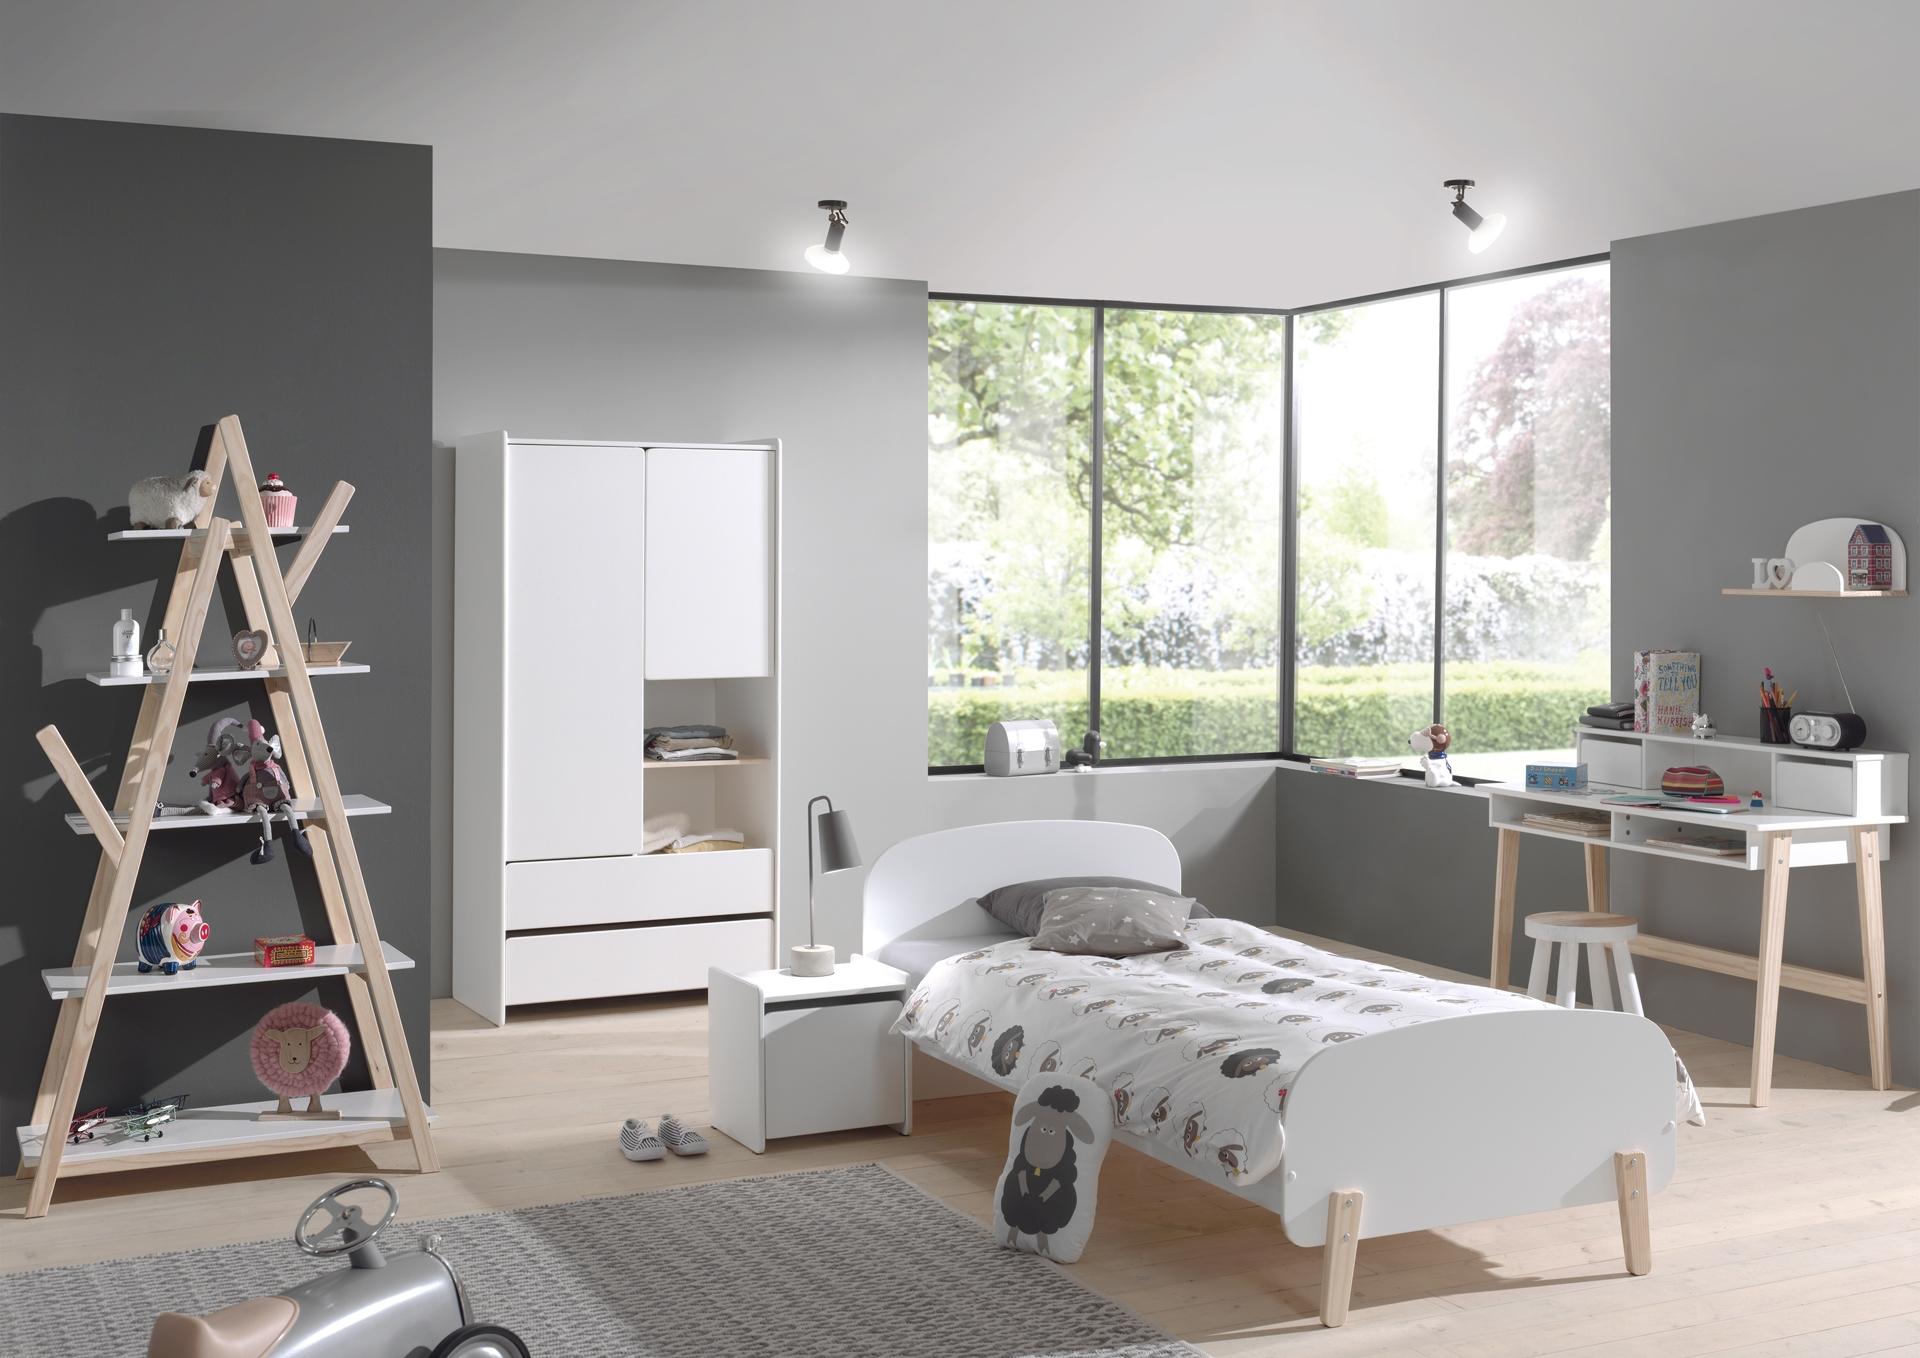 Set Mobila Dormitor Lemn Pin Mdf Copii Kiddy Alb